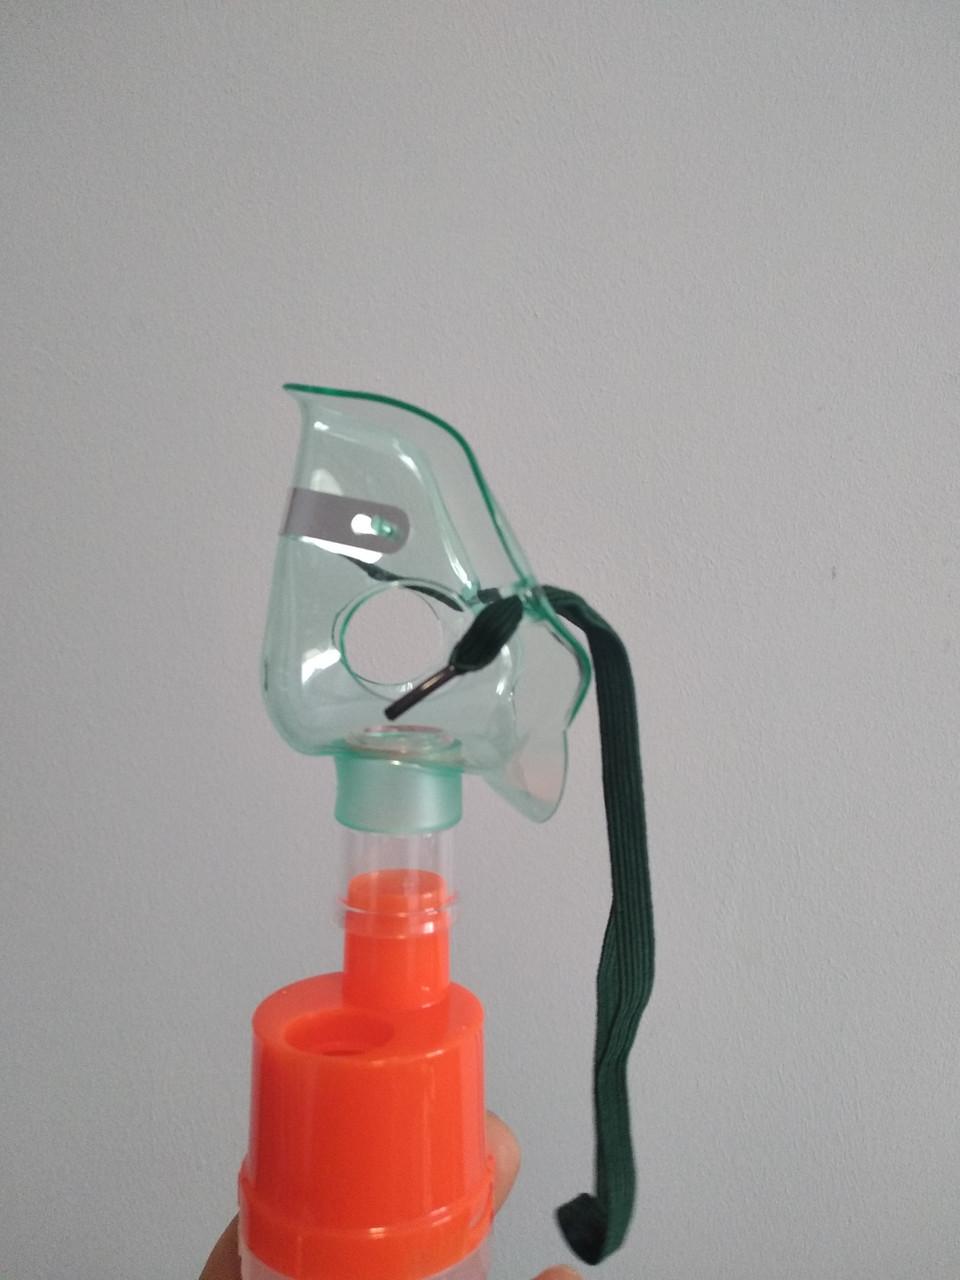 Маска для небулайзера неонатальная (младенческая)